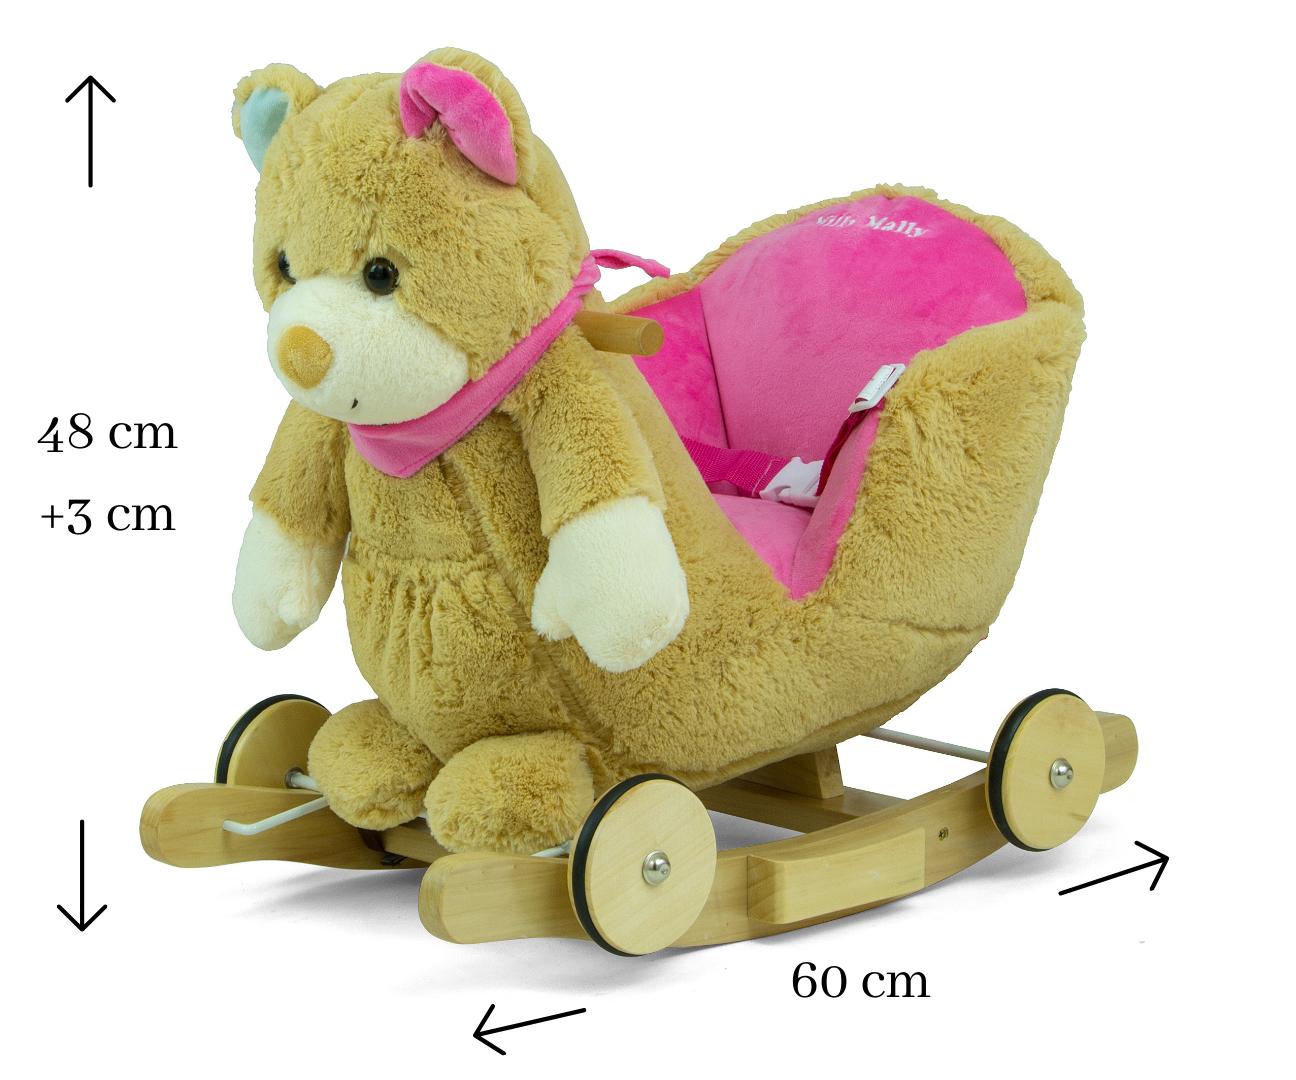 Milly Mally Miś Polly – Pink Bear